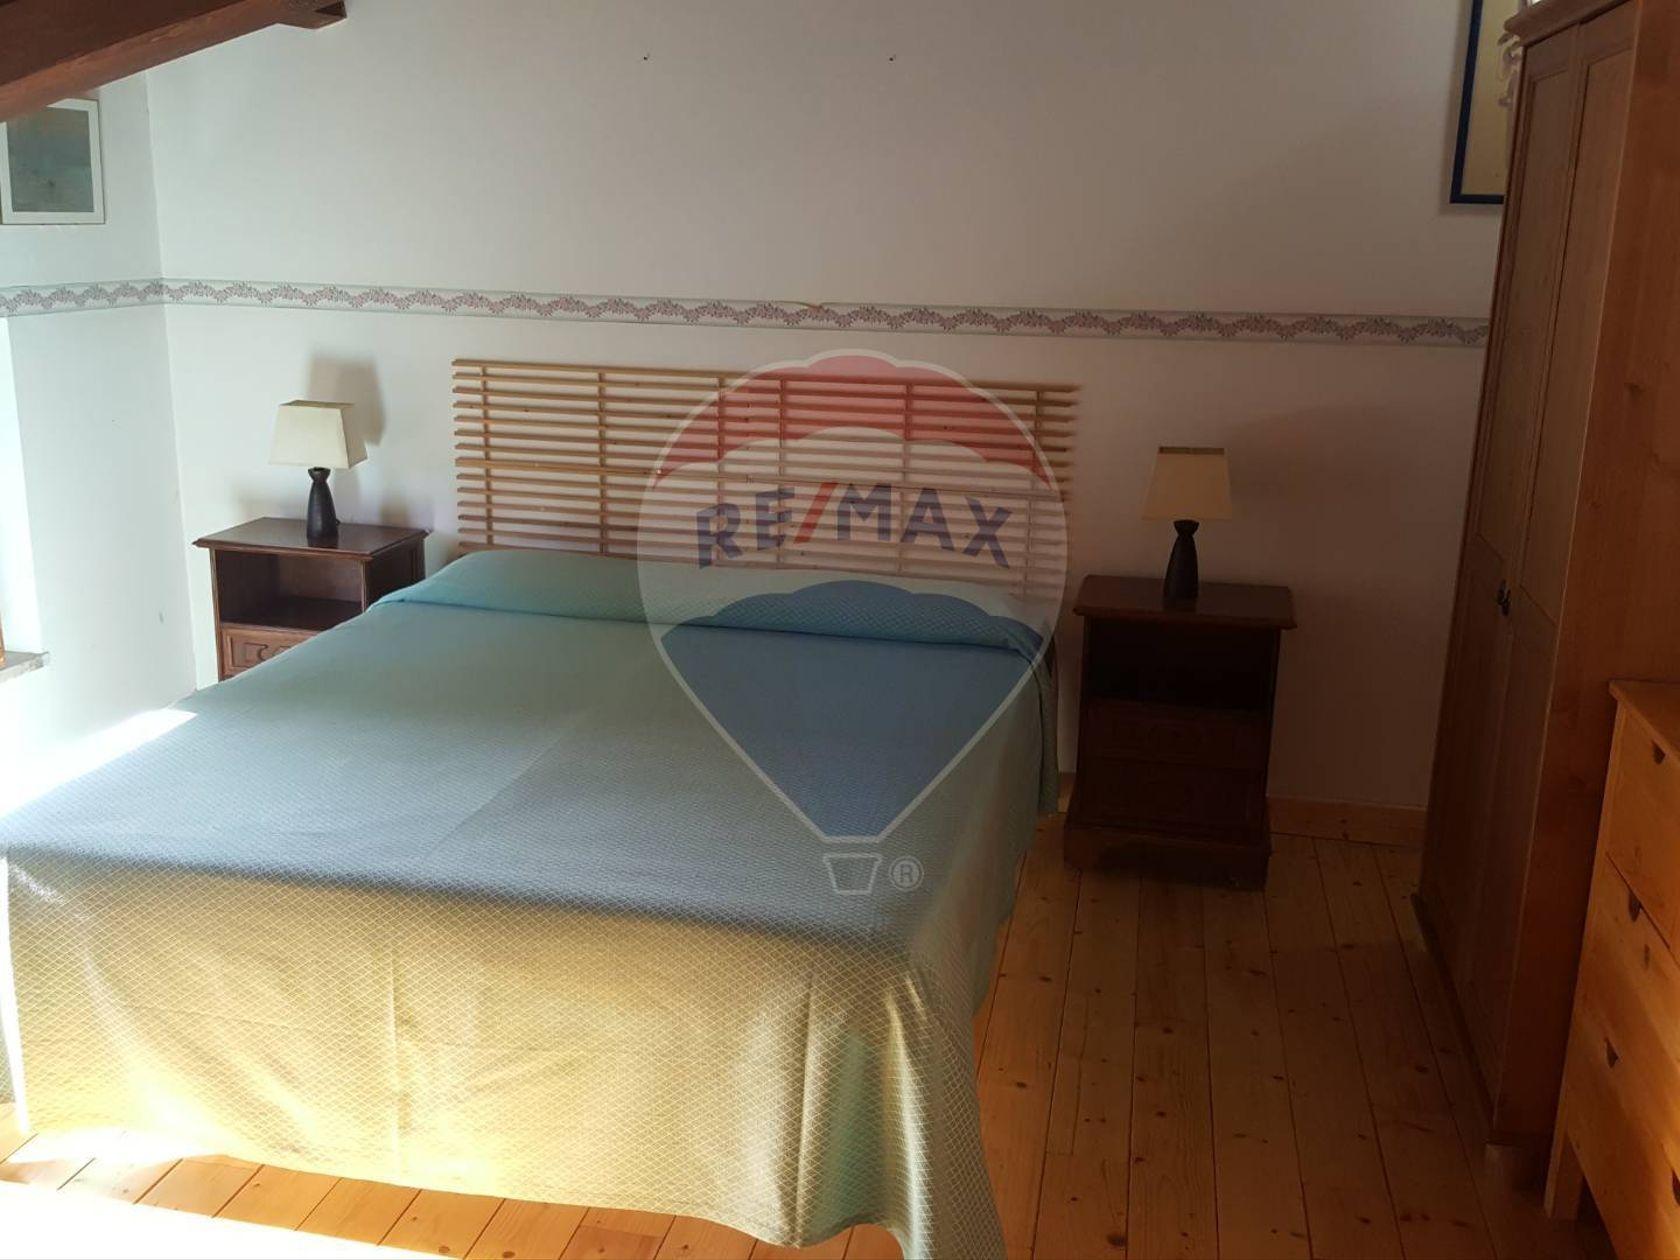 Albergo/Hotel Nepi, VT Vendita - Foto 13